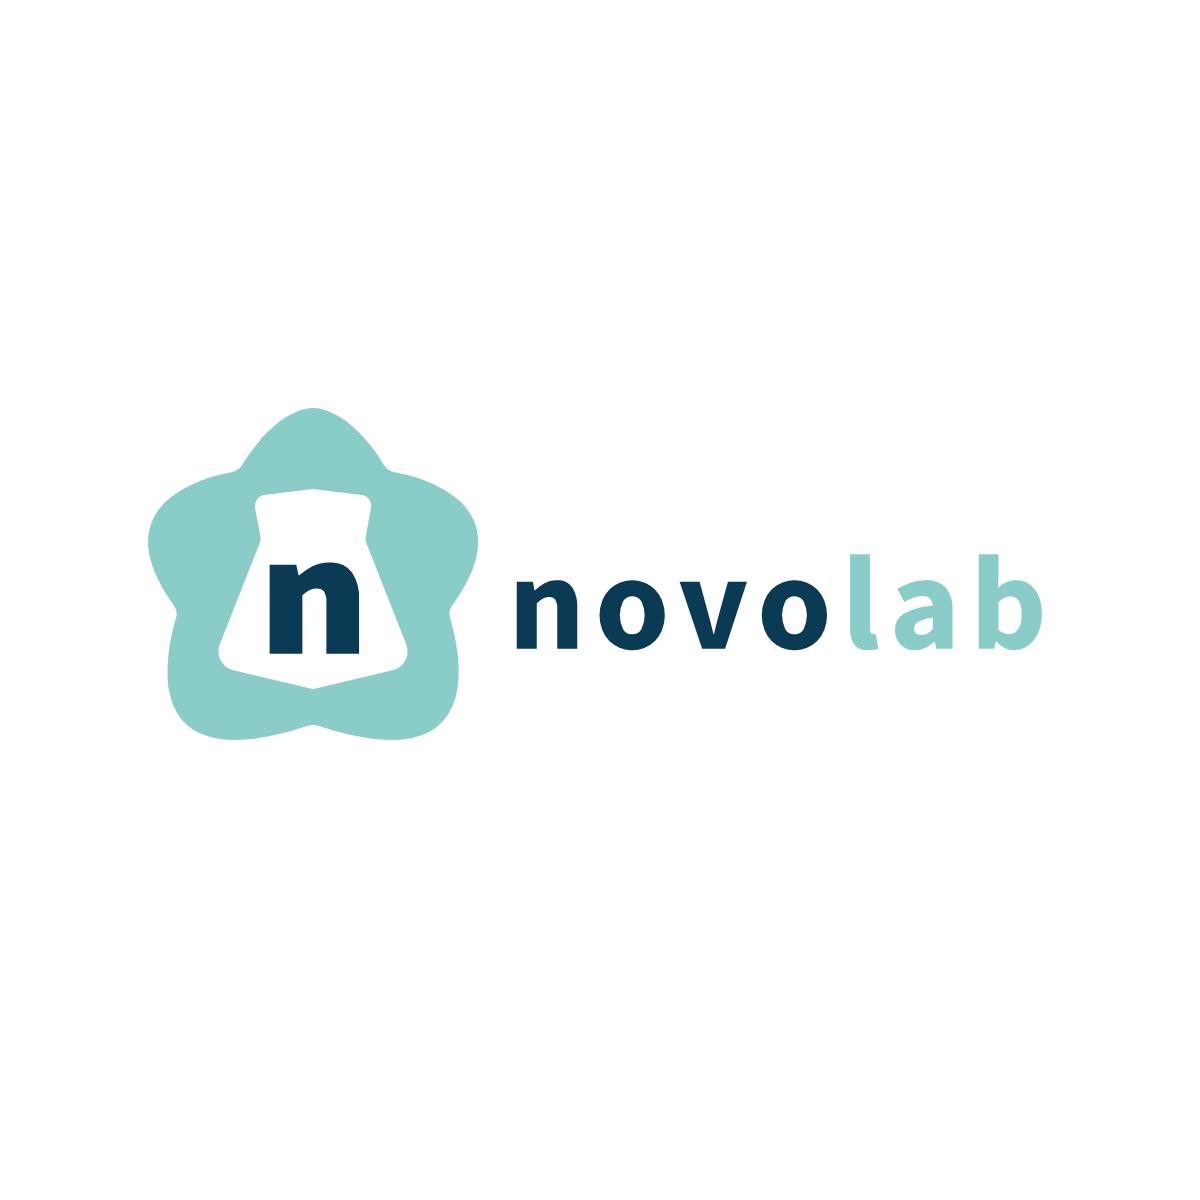 Novolab universele stand voor 4 pipetten, plexiglas transparant kleurloos